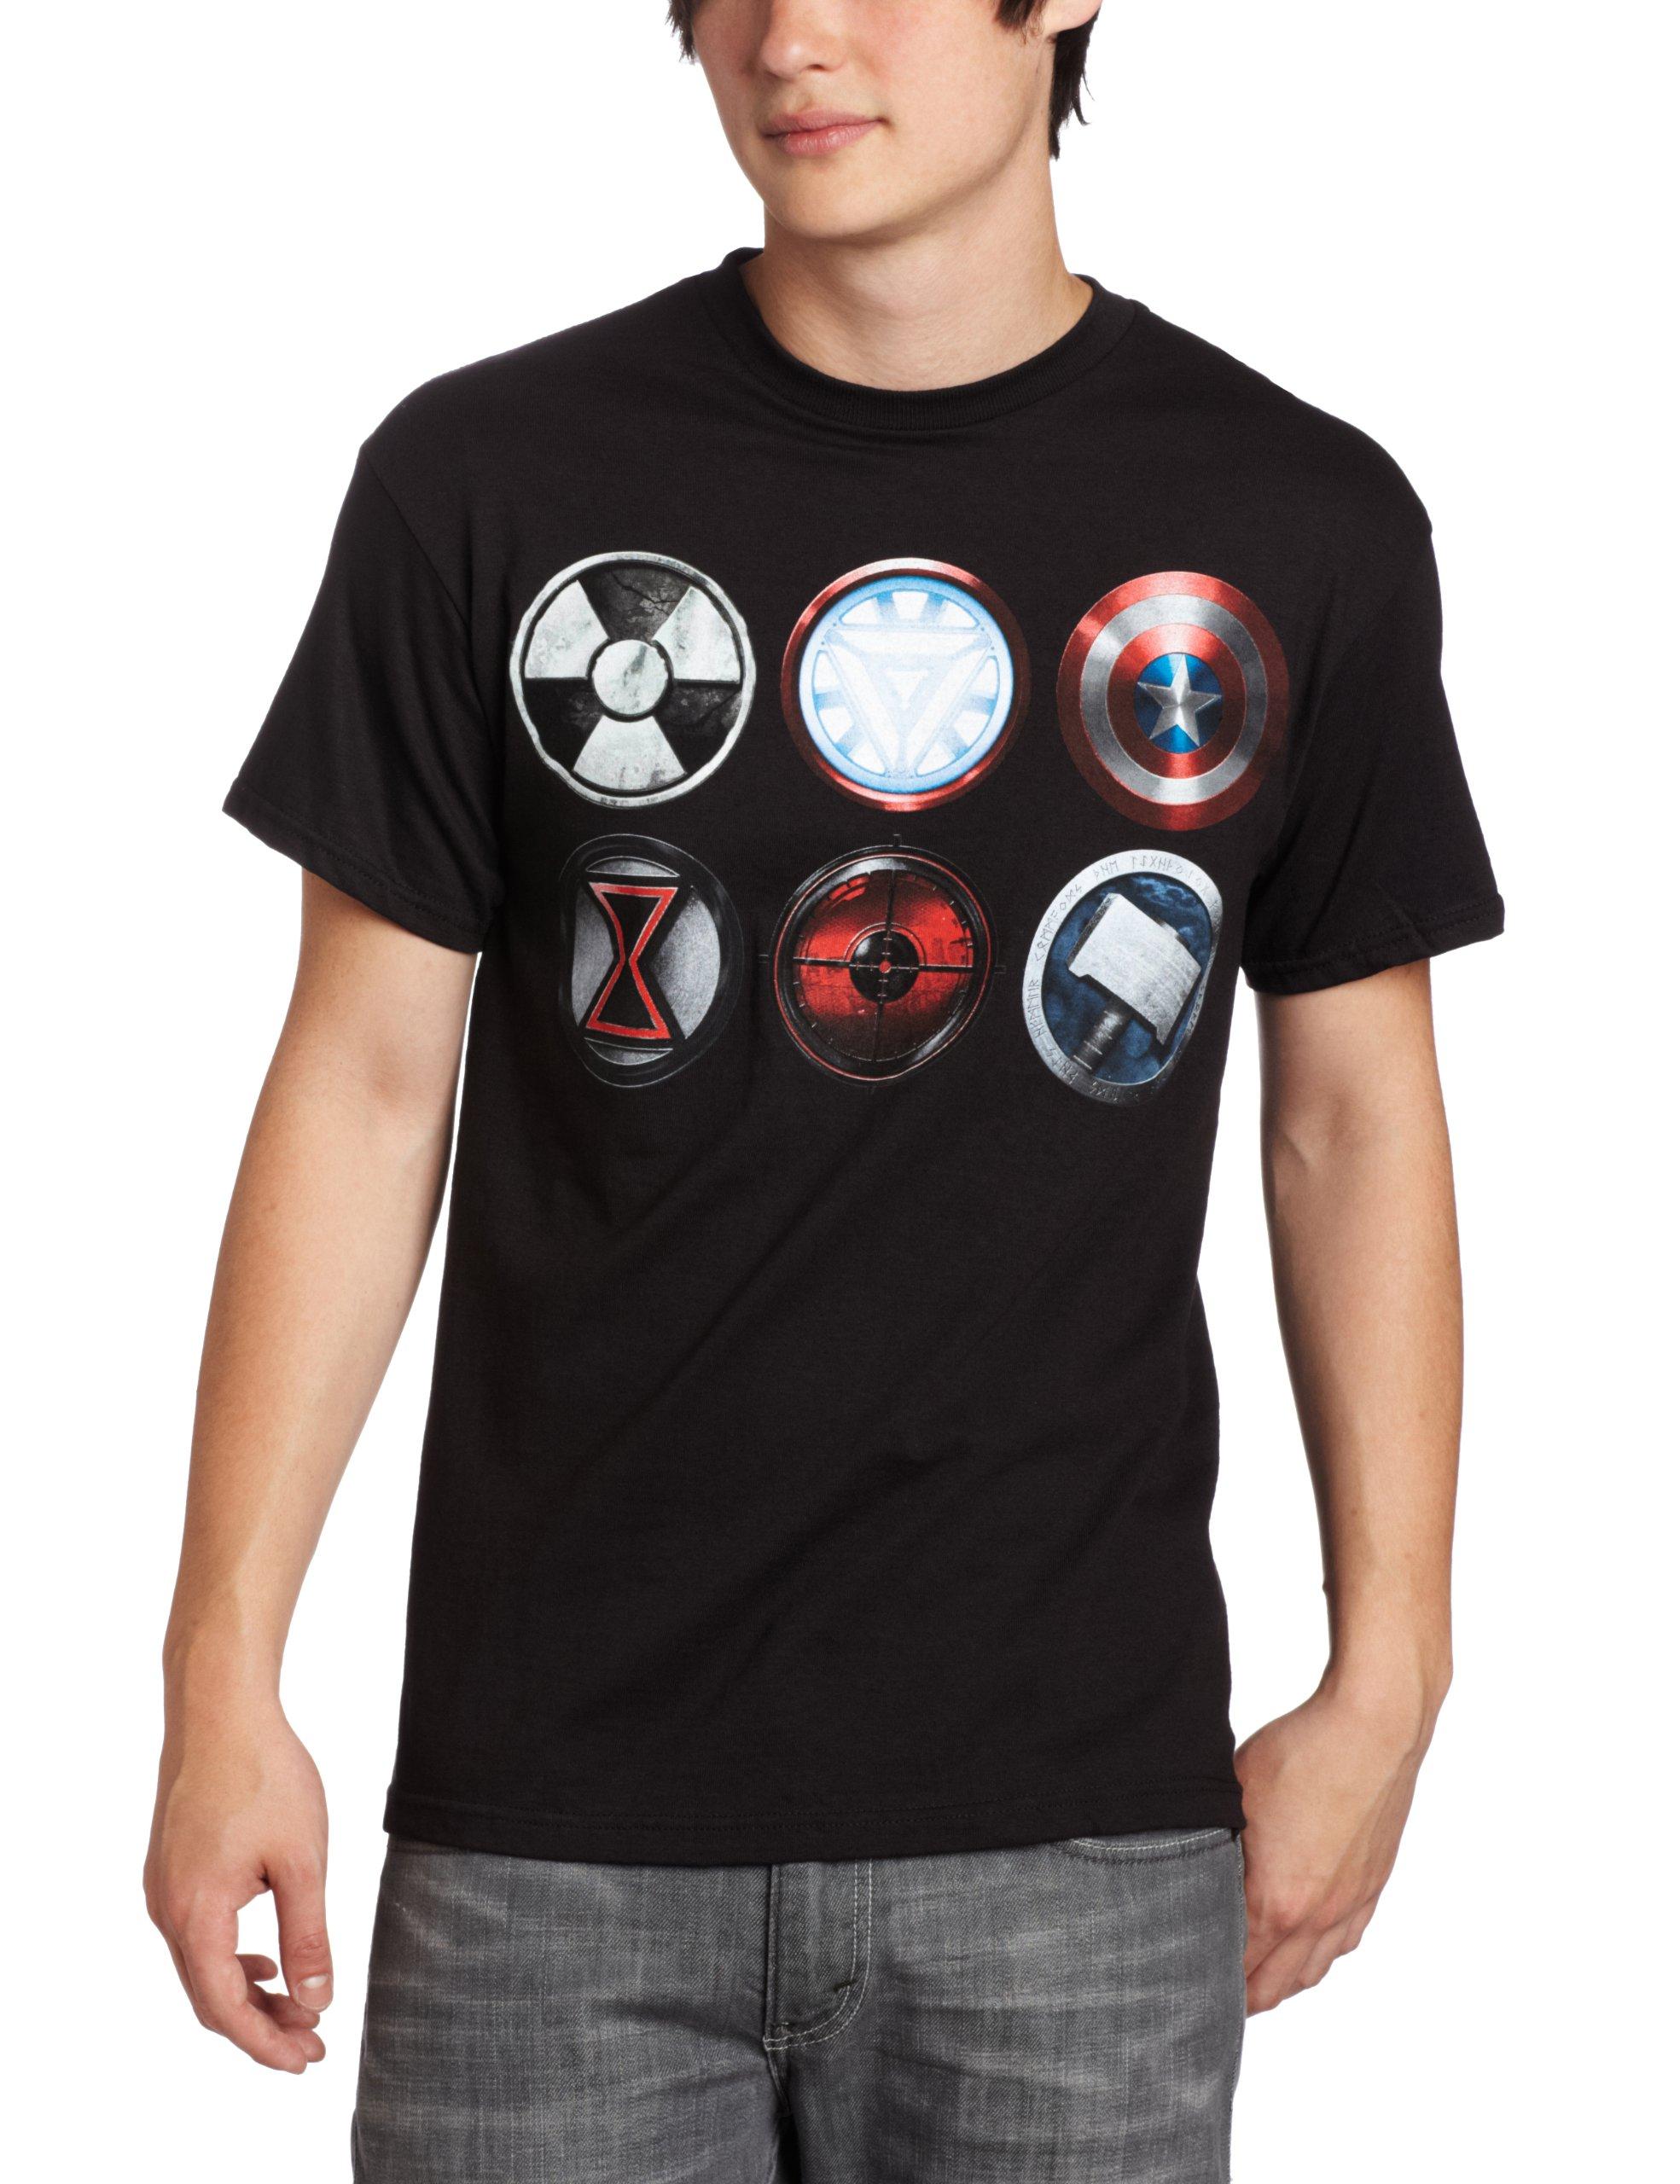 Straight Six T Shirt 6958